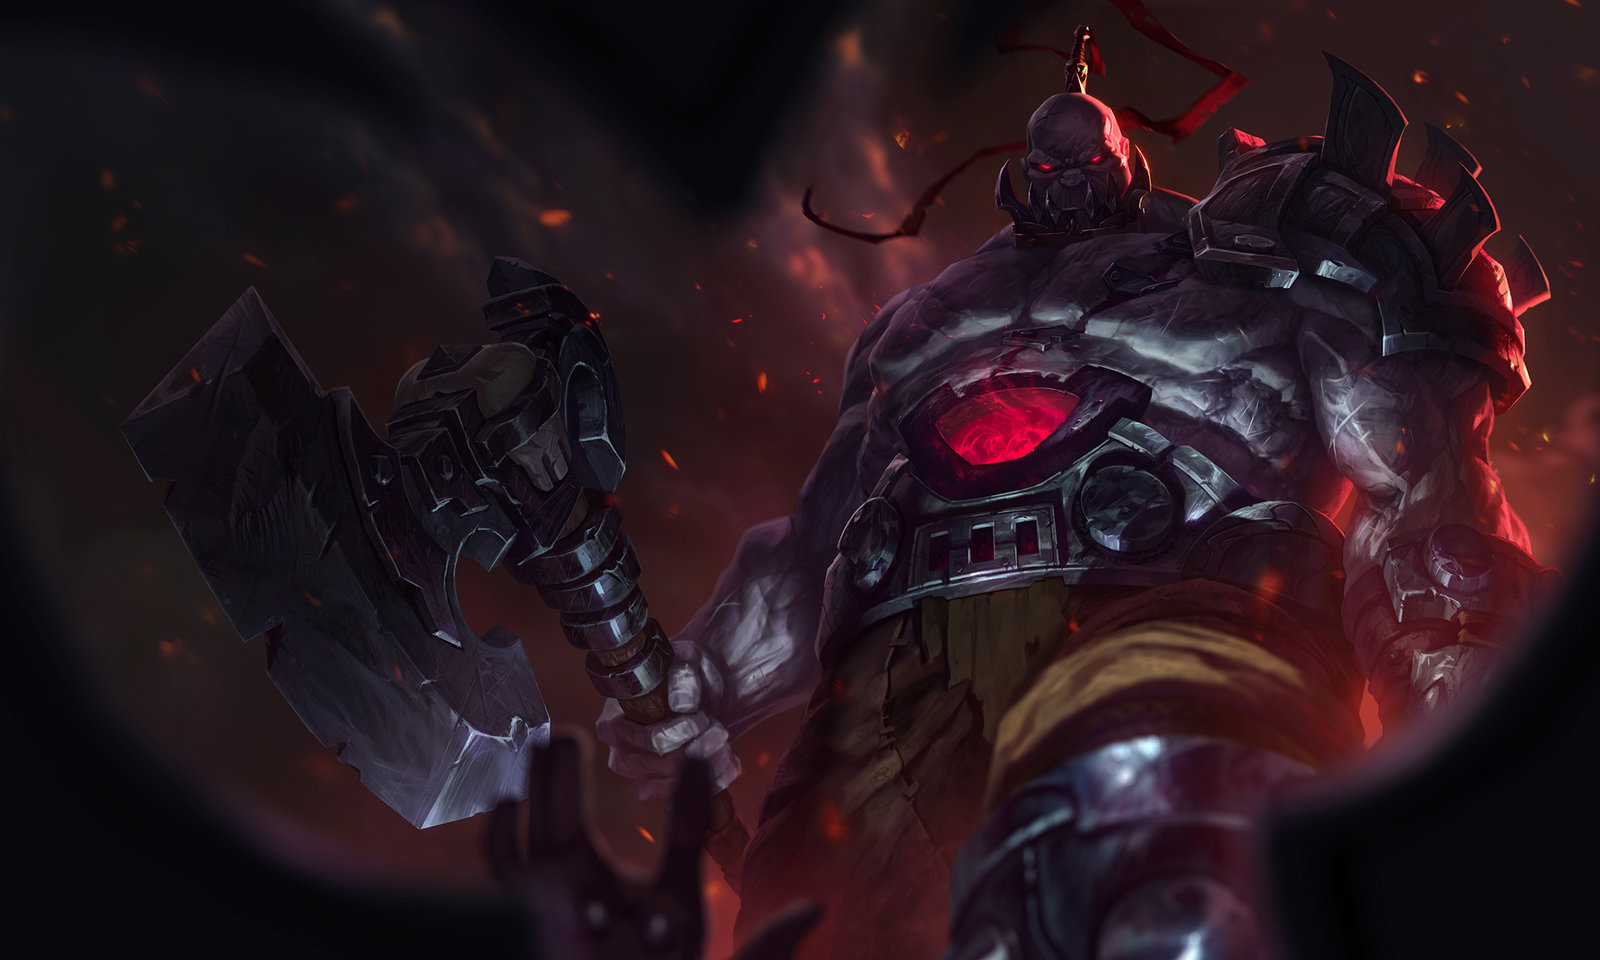 Sion, the Undead Juggernaut